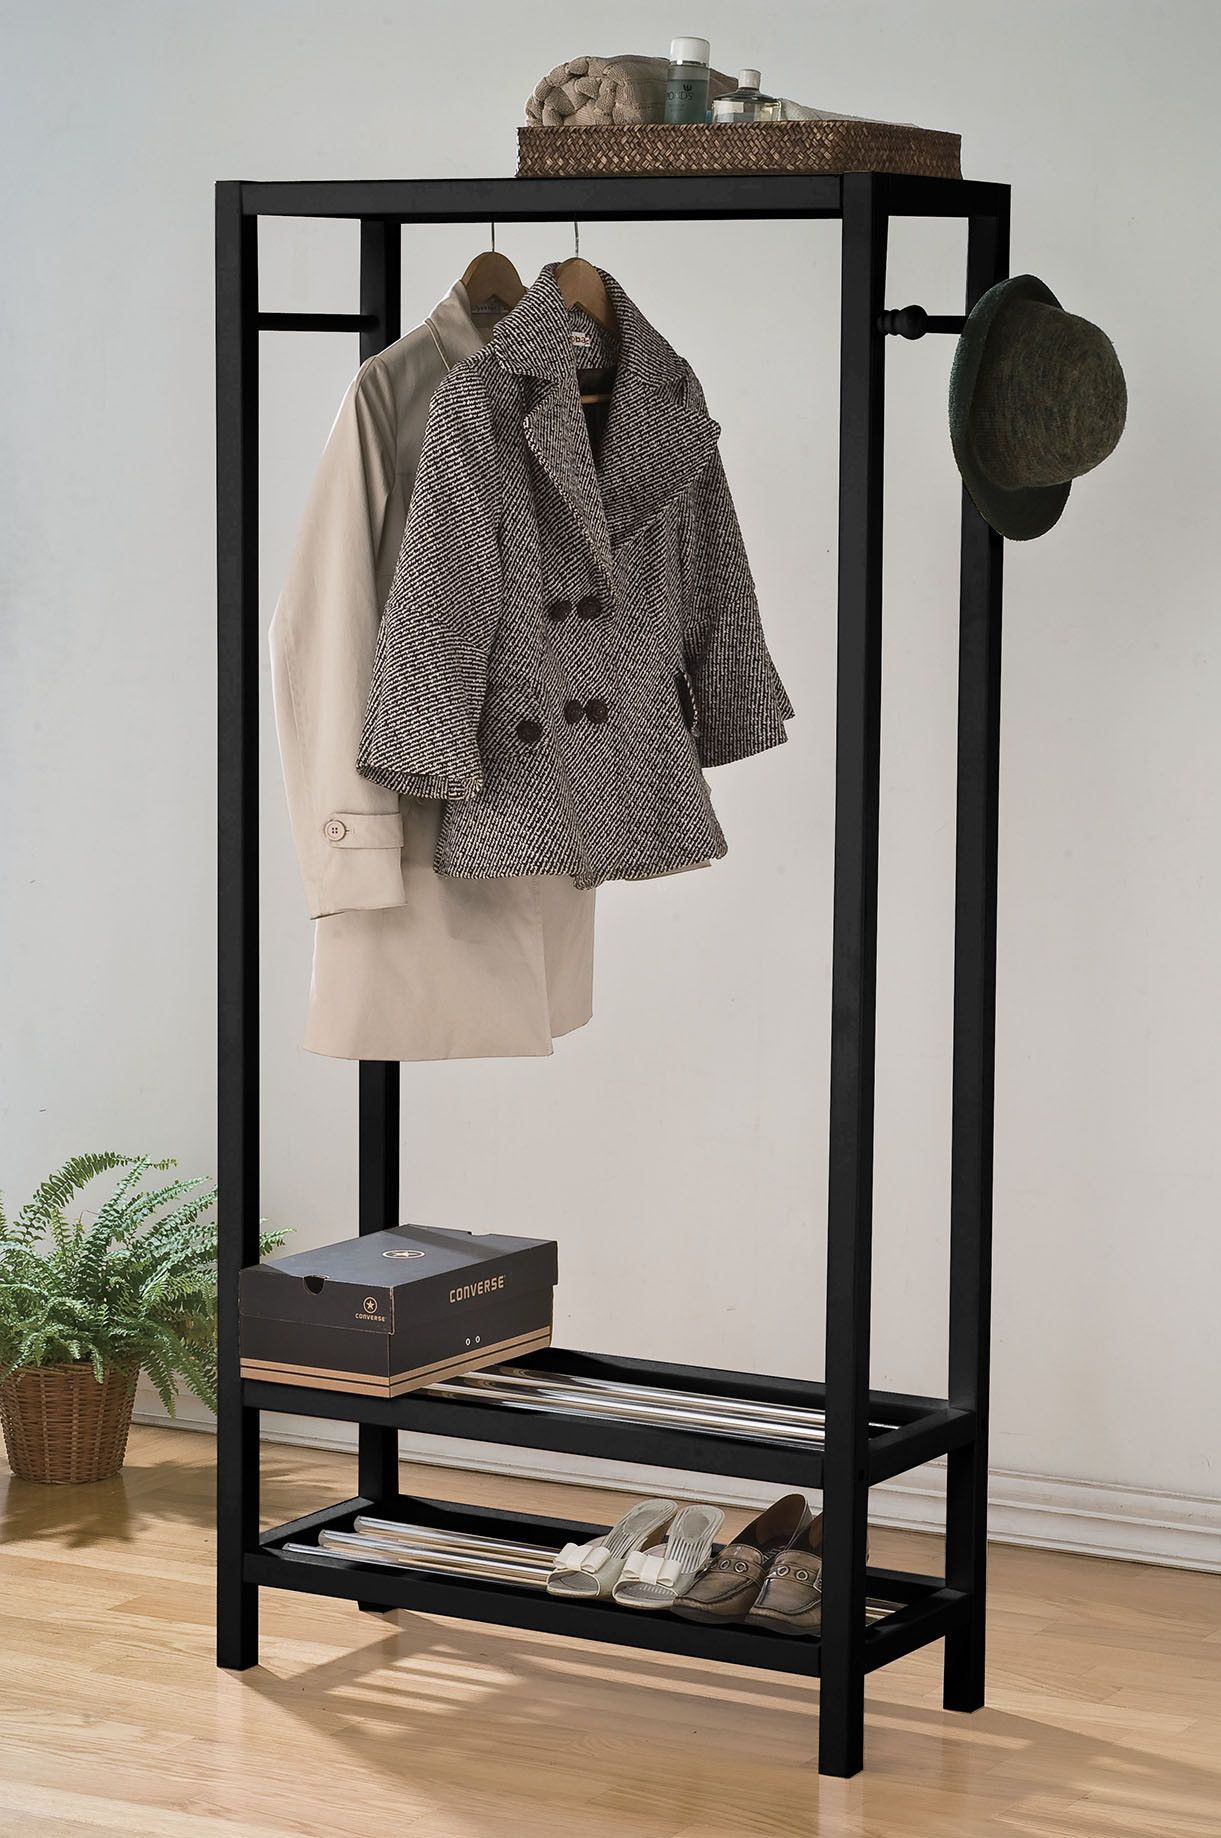 Buy acme maeve garment rack black at hhoutlets for only